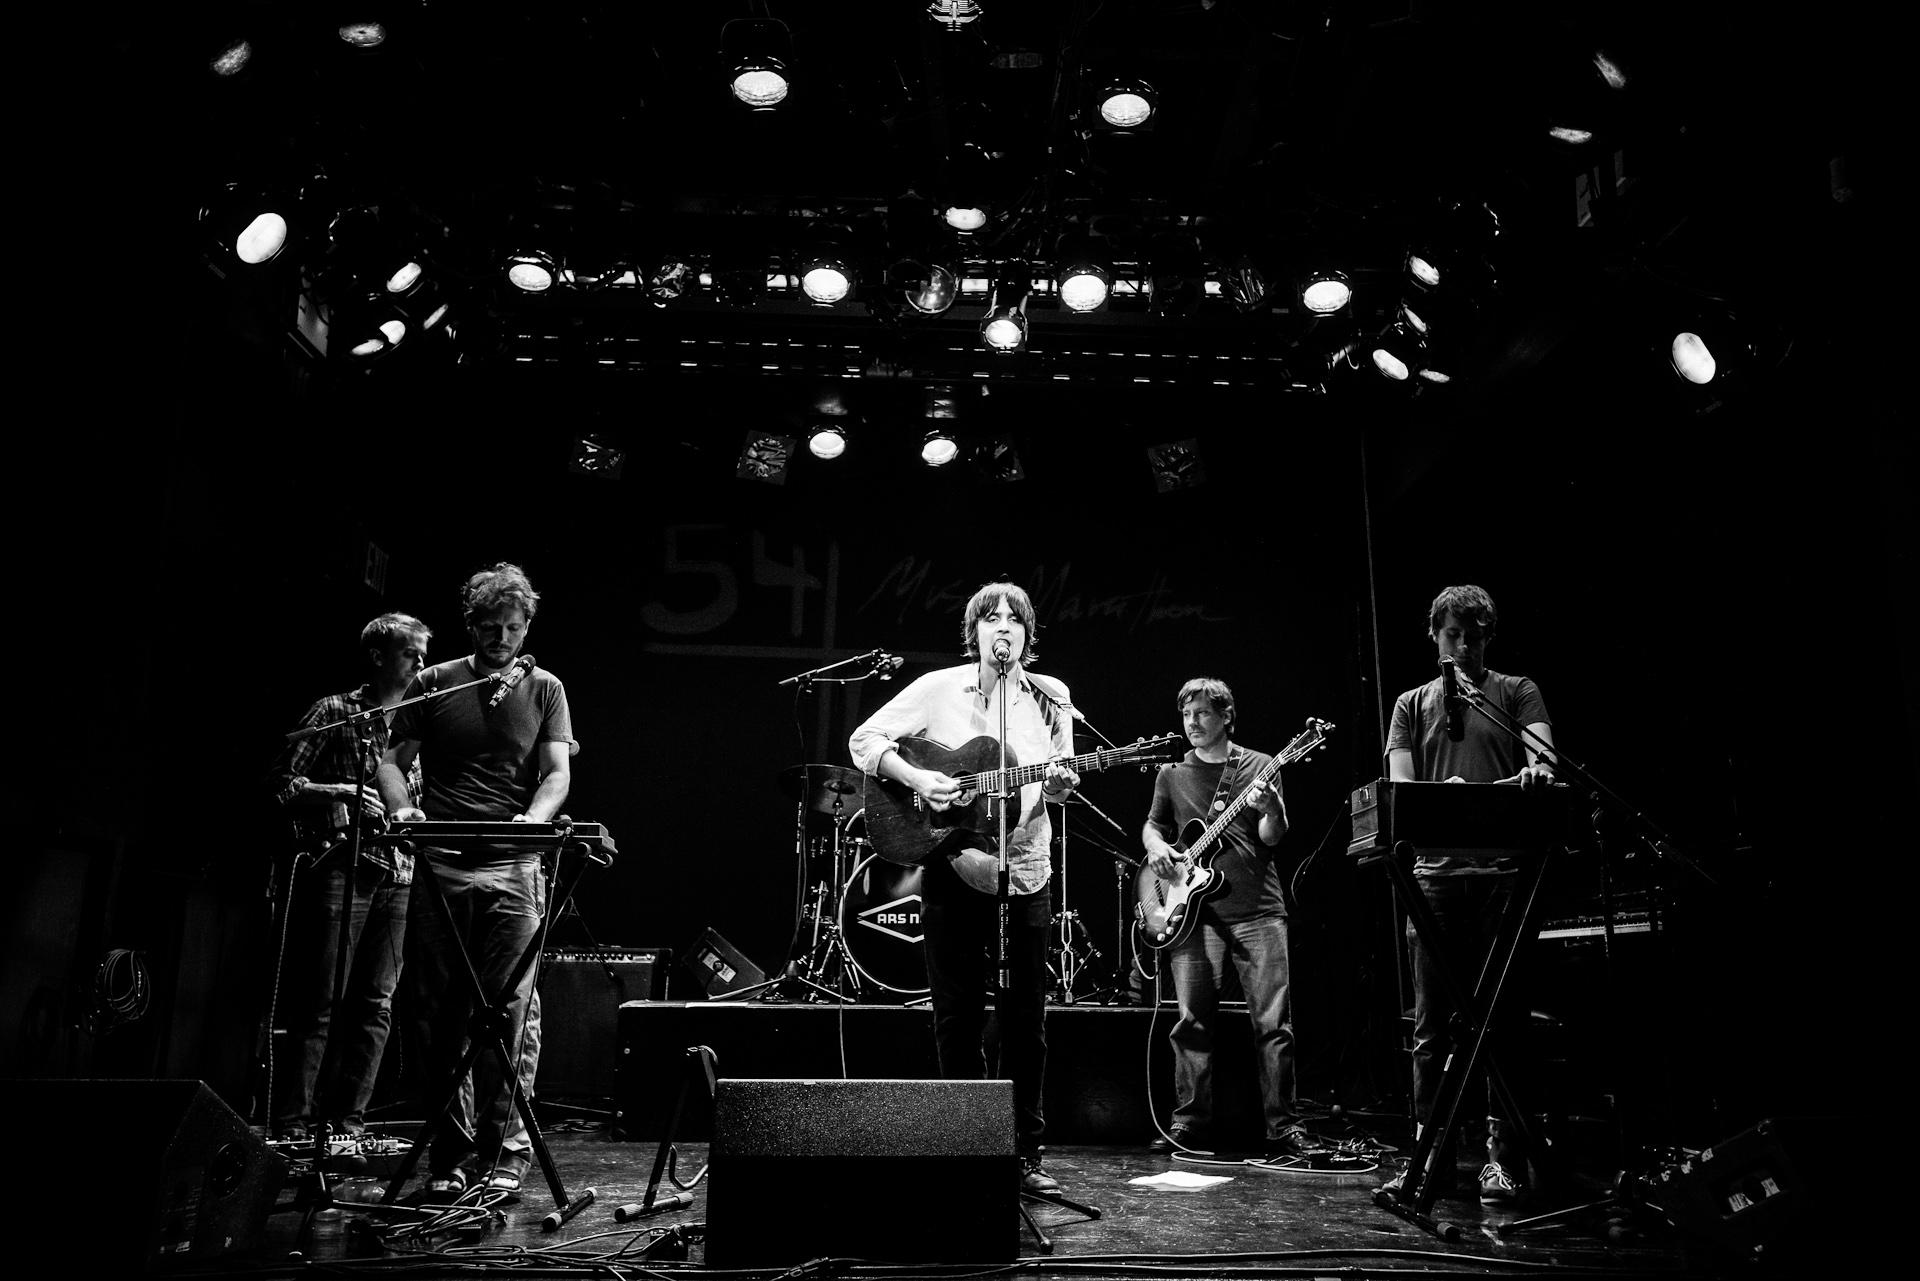 Ars Nova (NYC) Aug. '12